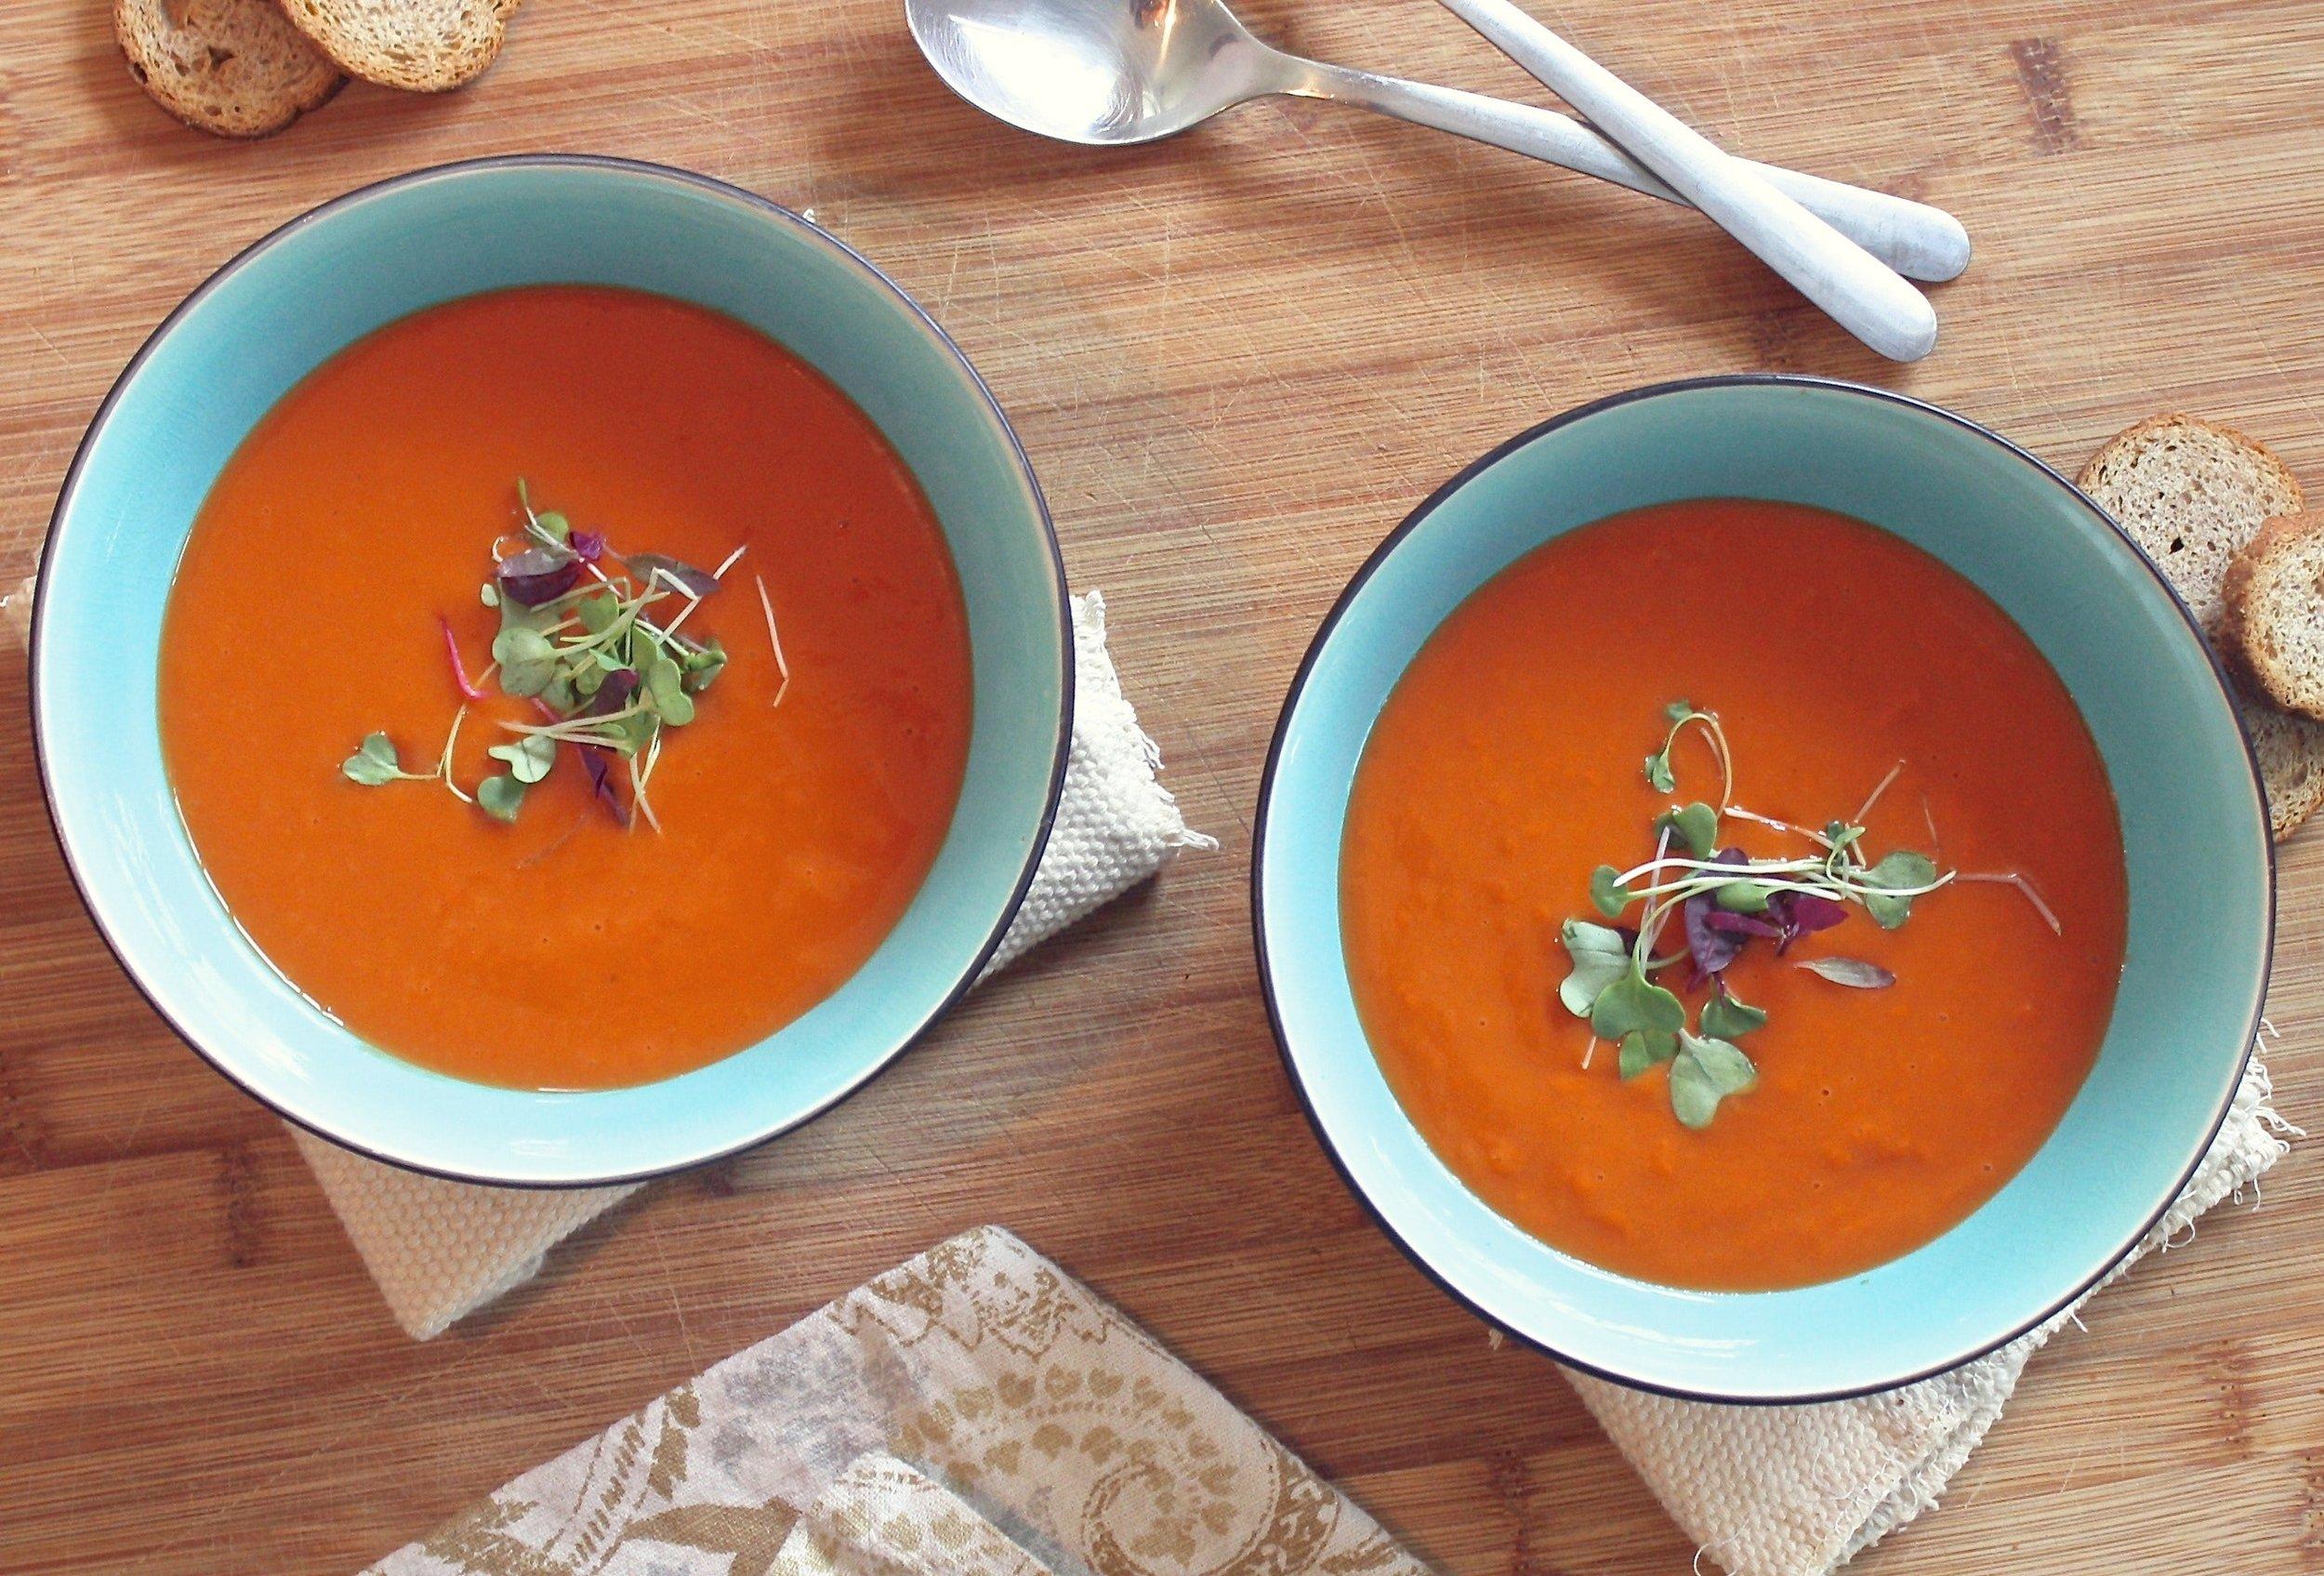 uwm.gazpacho.appetizer-bowls-cream-262947.jpg